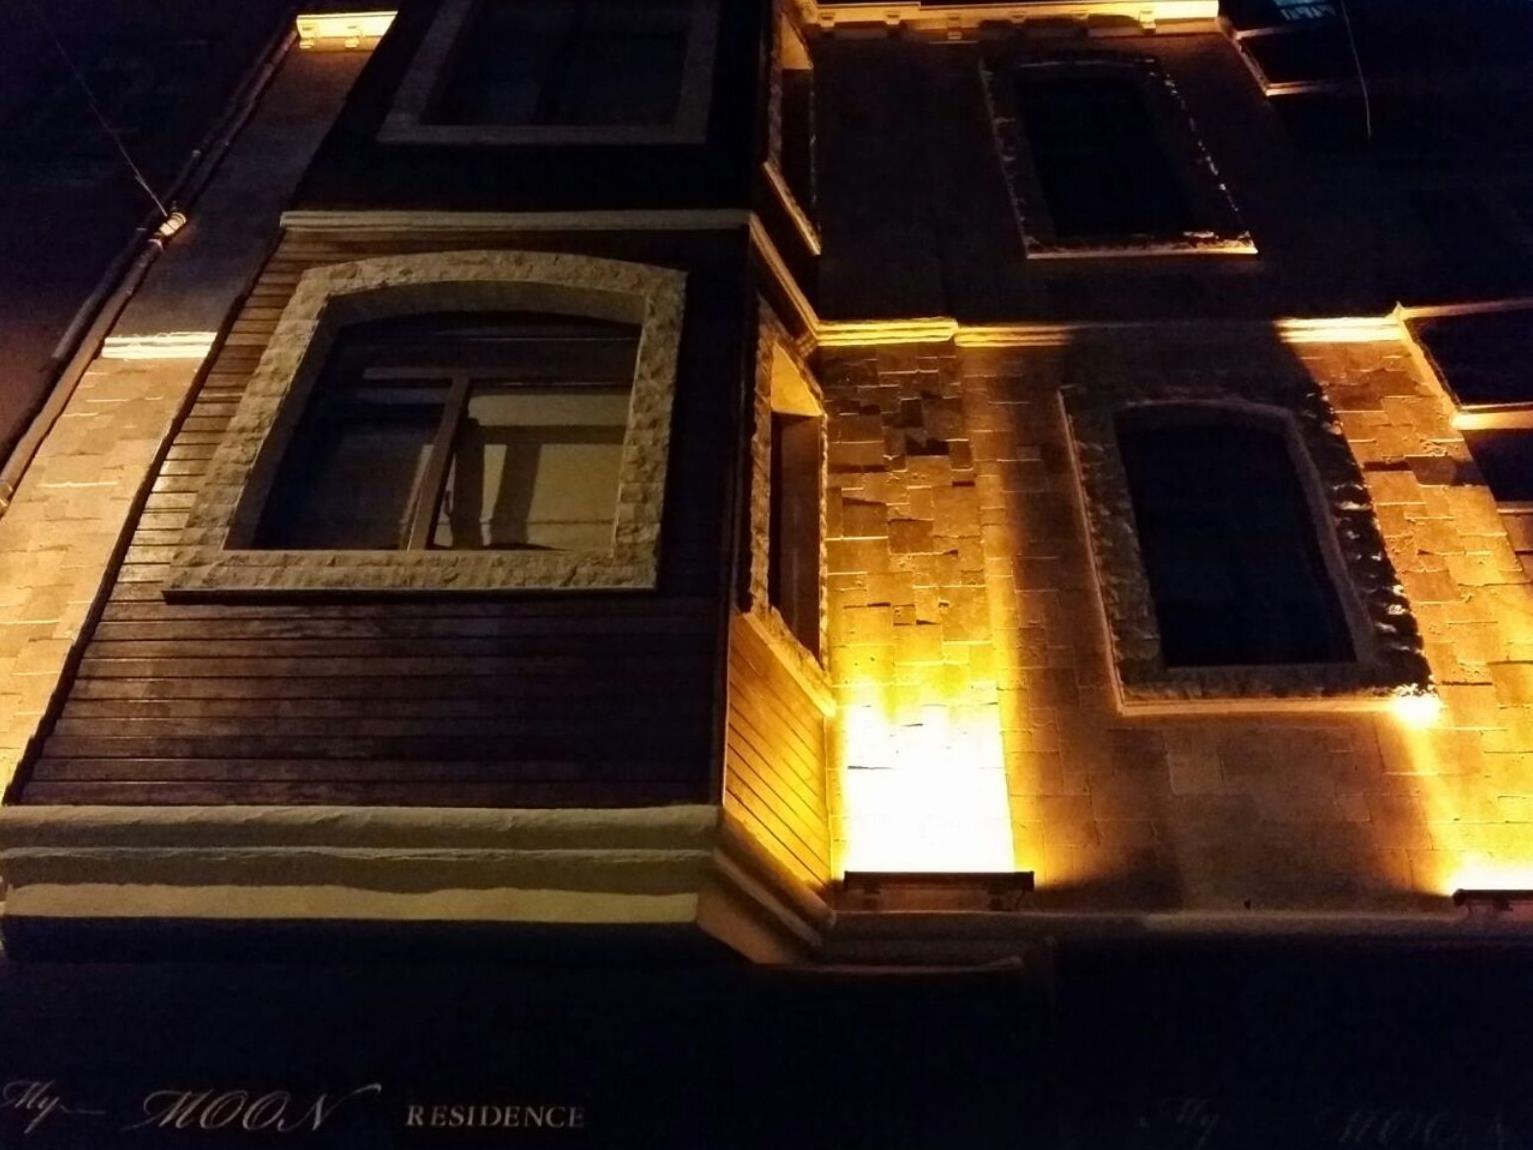 Mymoon Residence